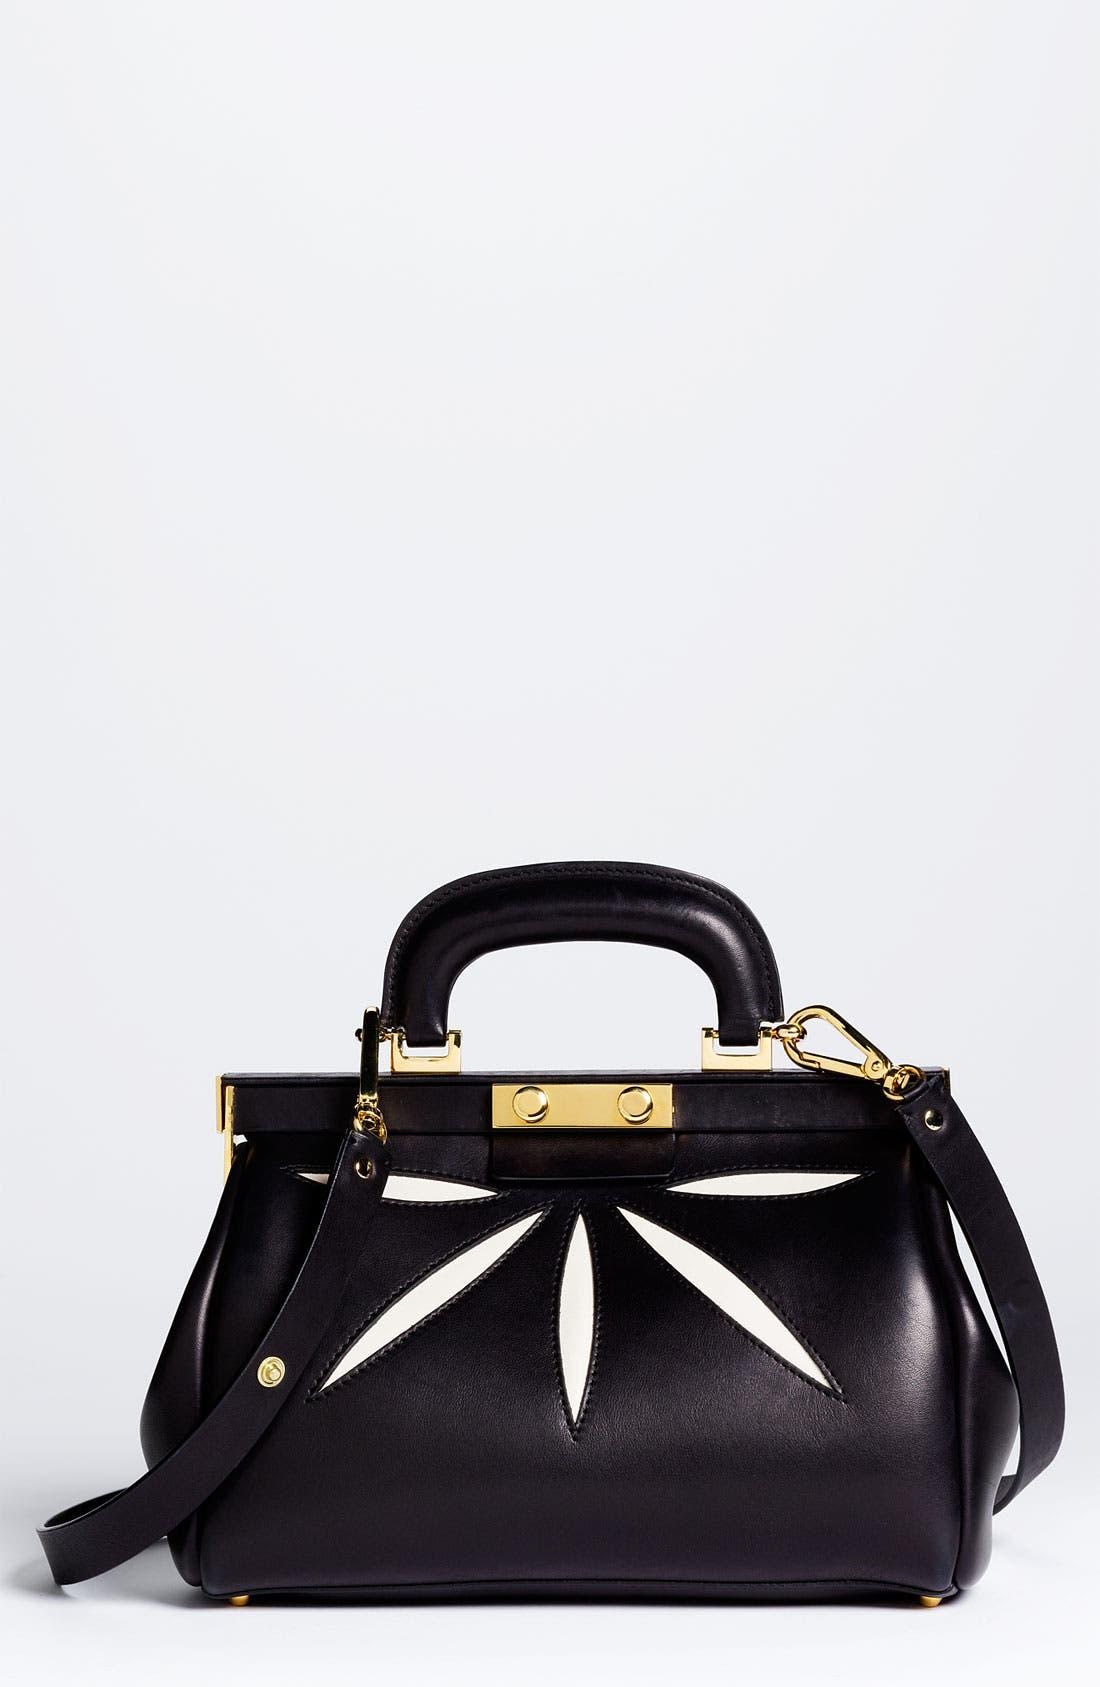 Alternate Image 1 Selected - Marni 'Mini' Leather Frame Bag